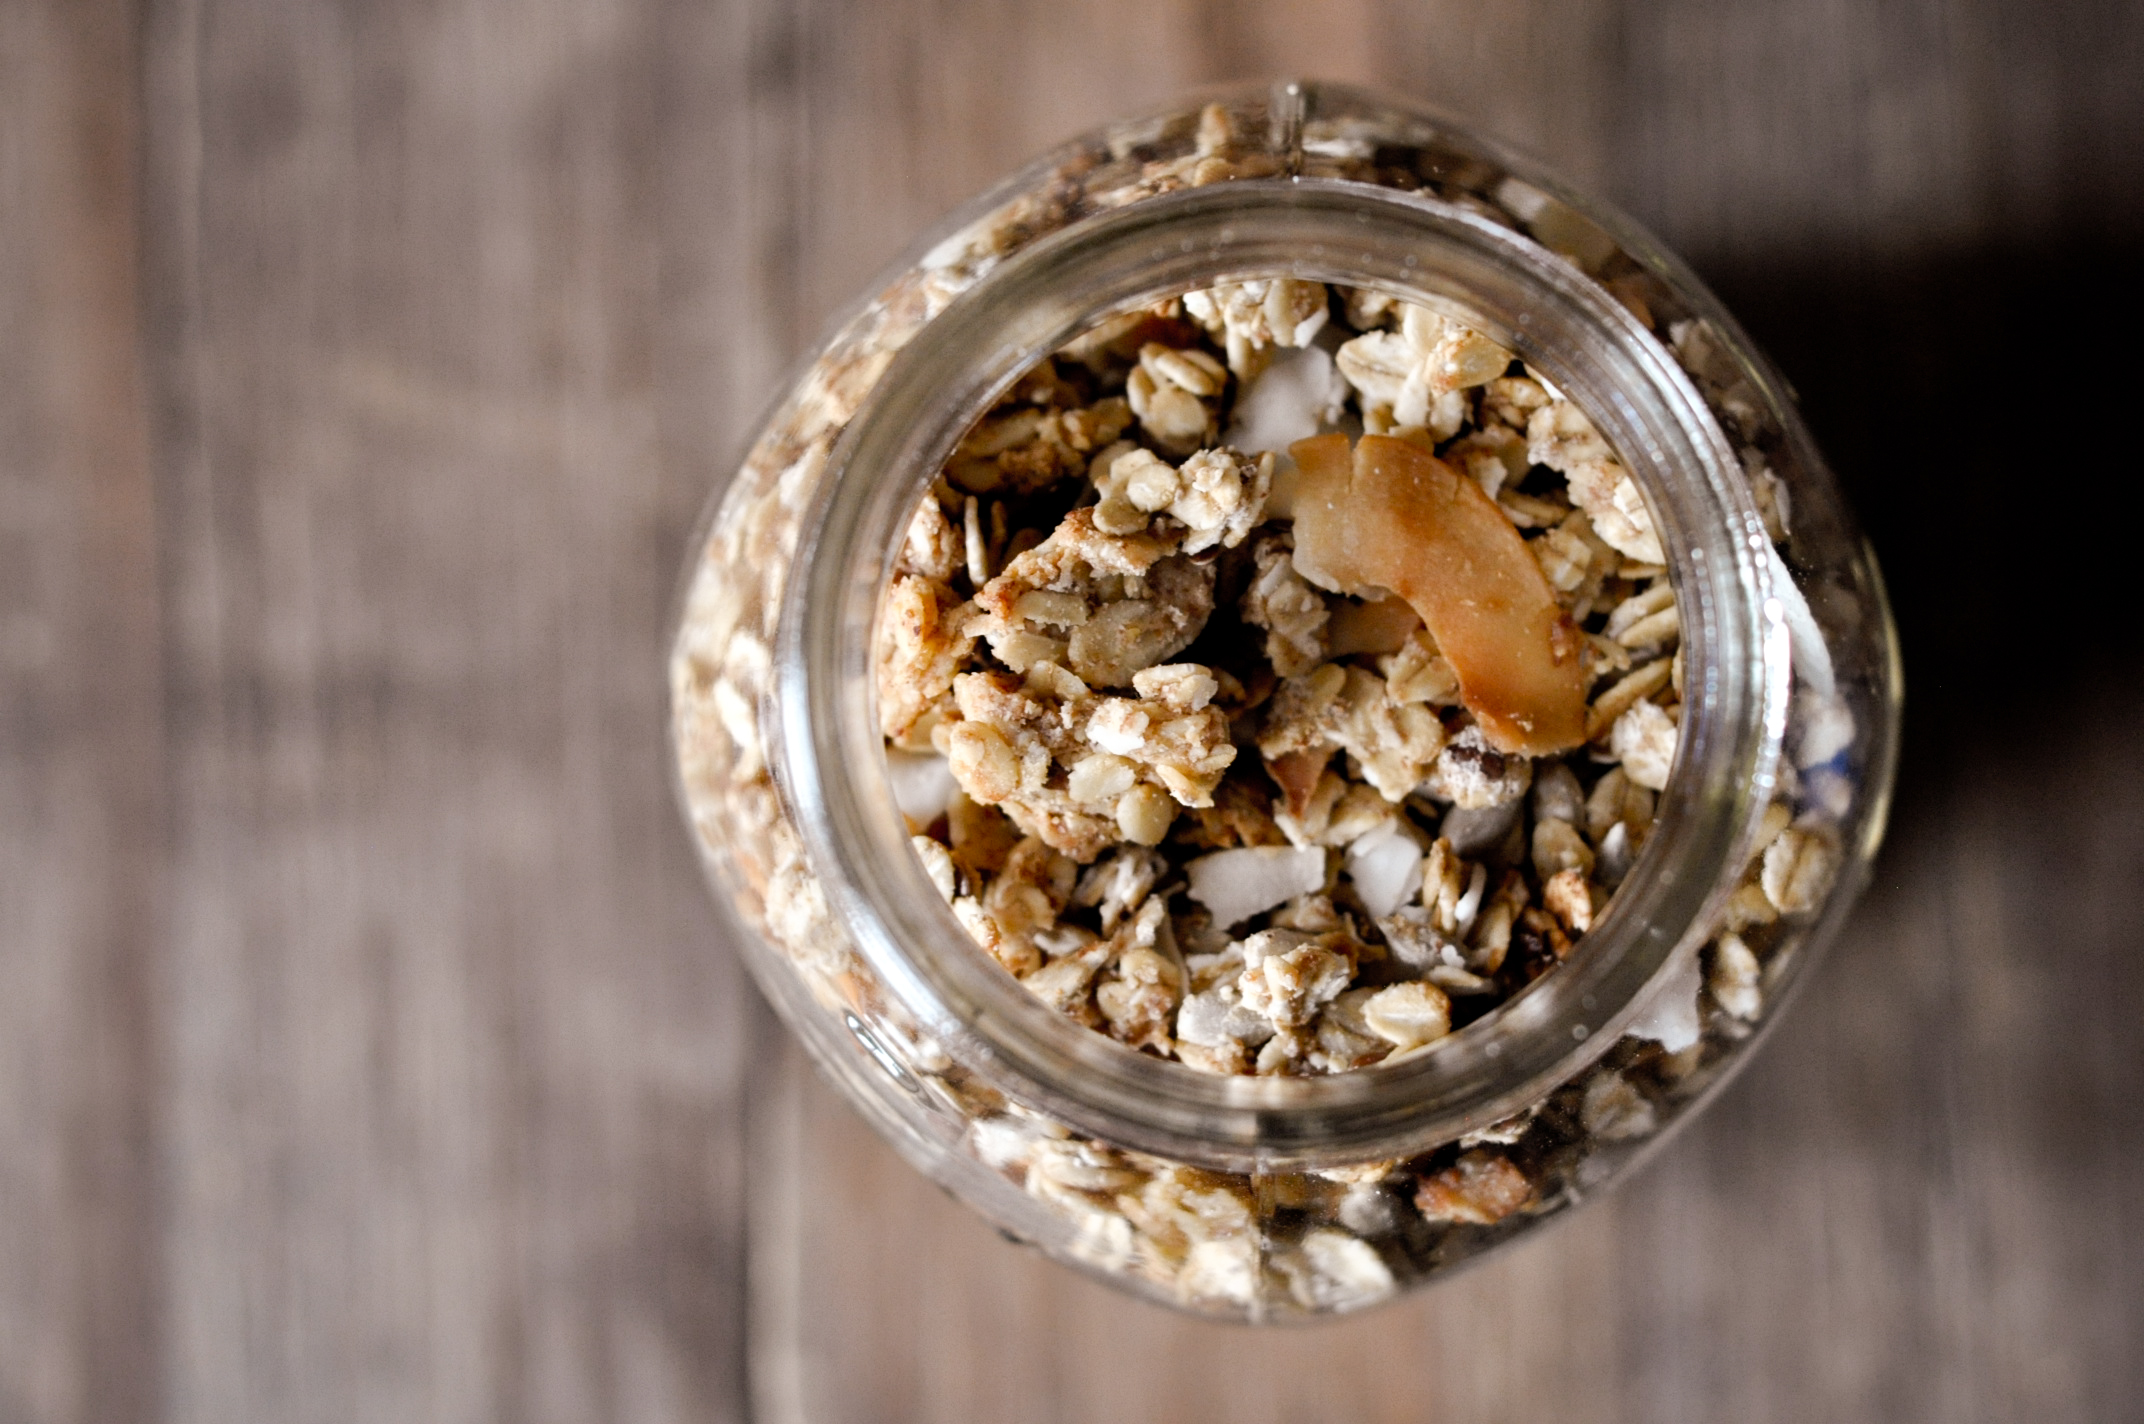 Homemade-nut-coconut-oat-granola.jpg